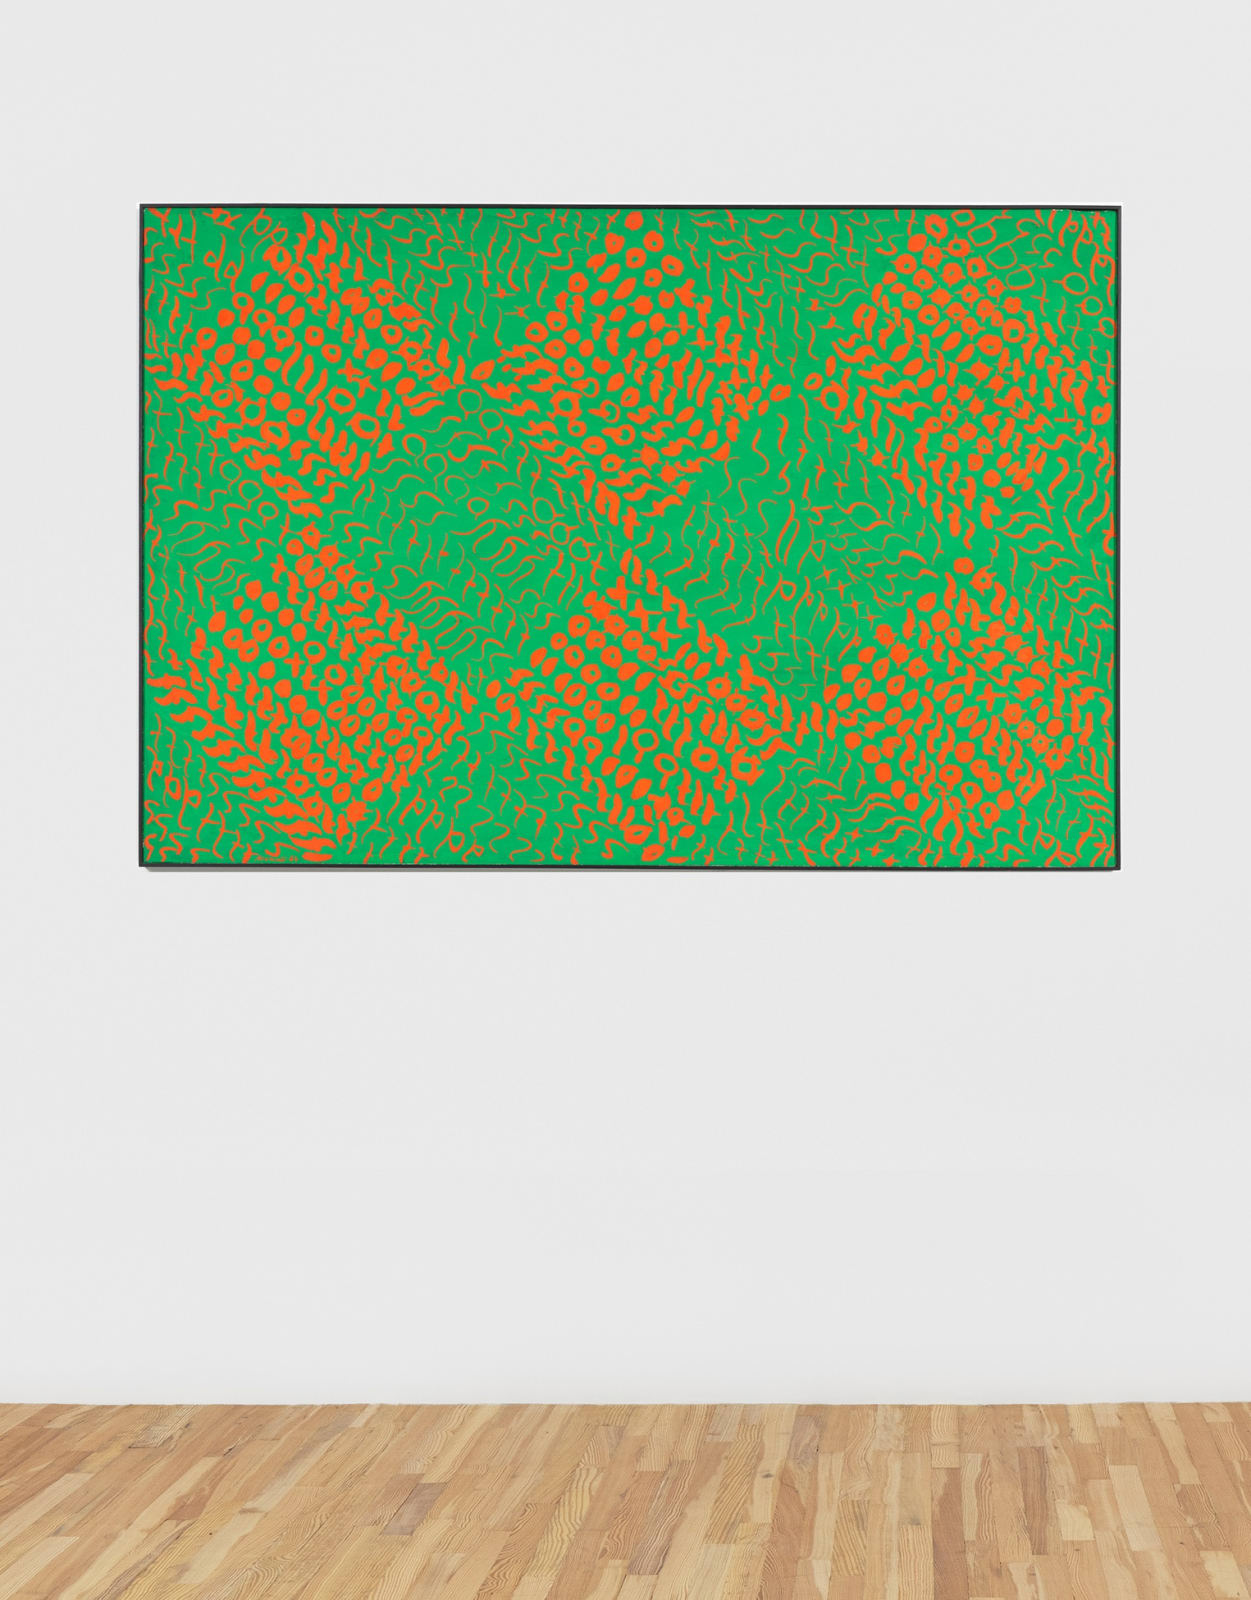 Carla Accardi Verdearancio n. 2, 1964 Casein on canvas 38 1/5 x 55 9/10 in (97 x 142 cm)